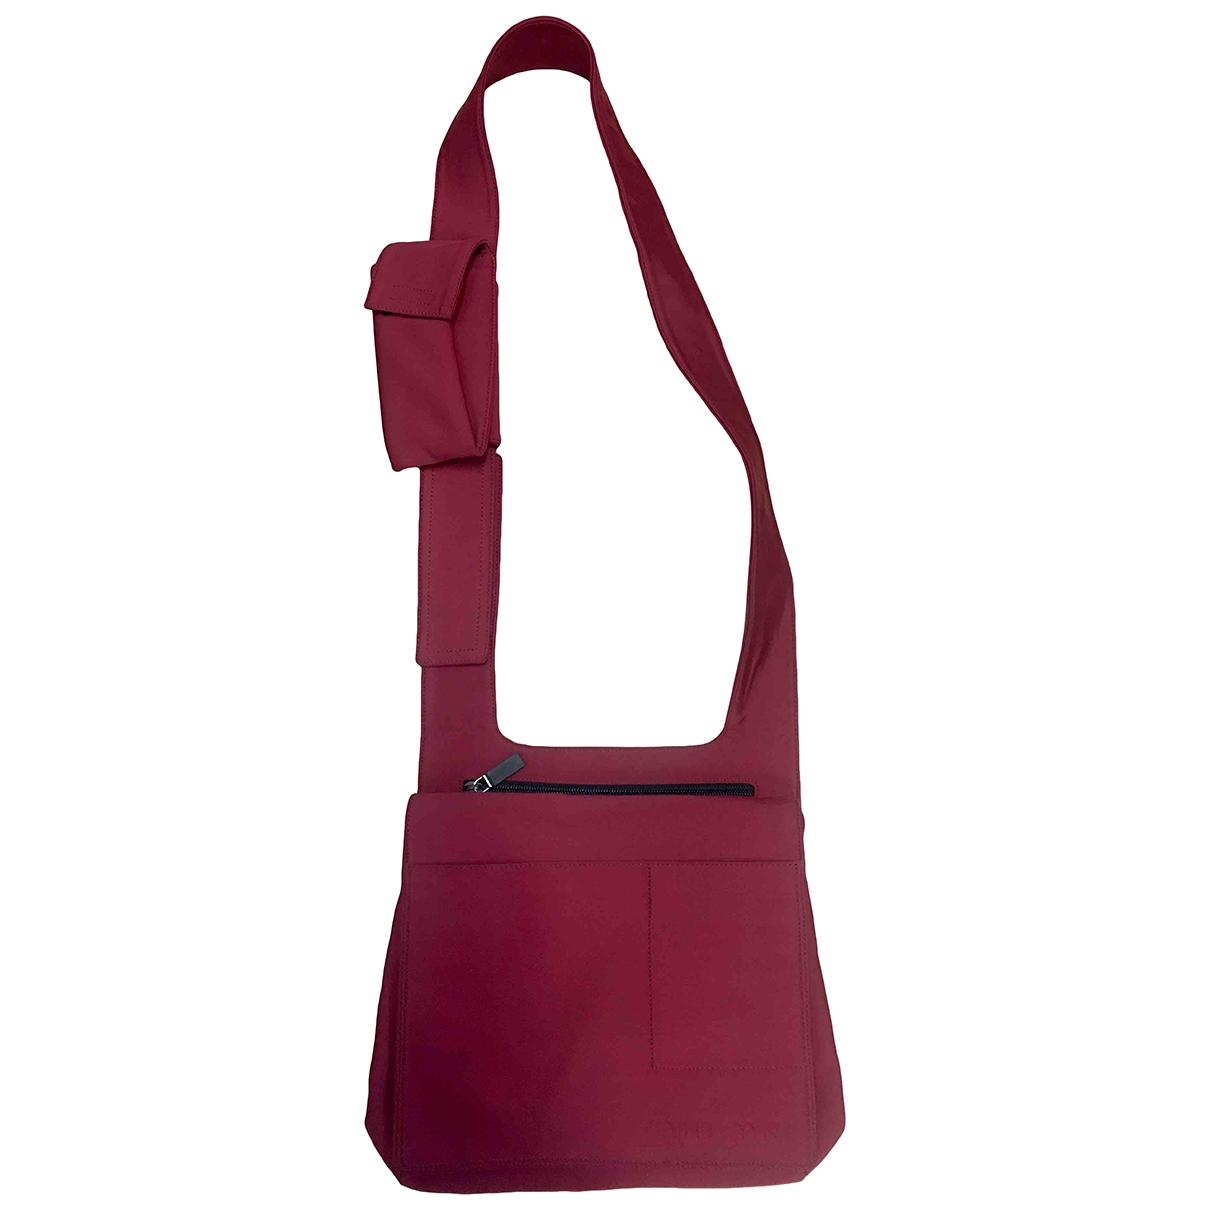 Miu Miu \N Handtasche in  Rot Leinen